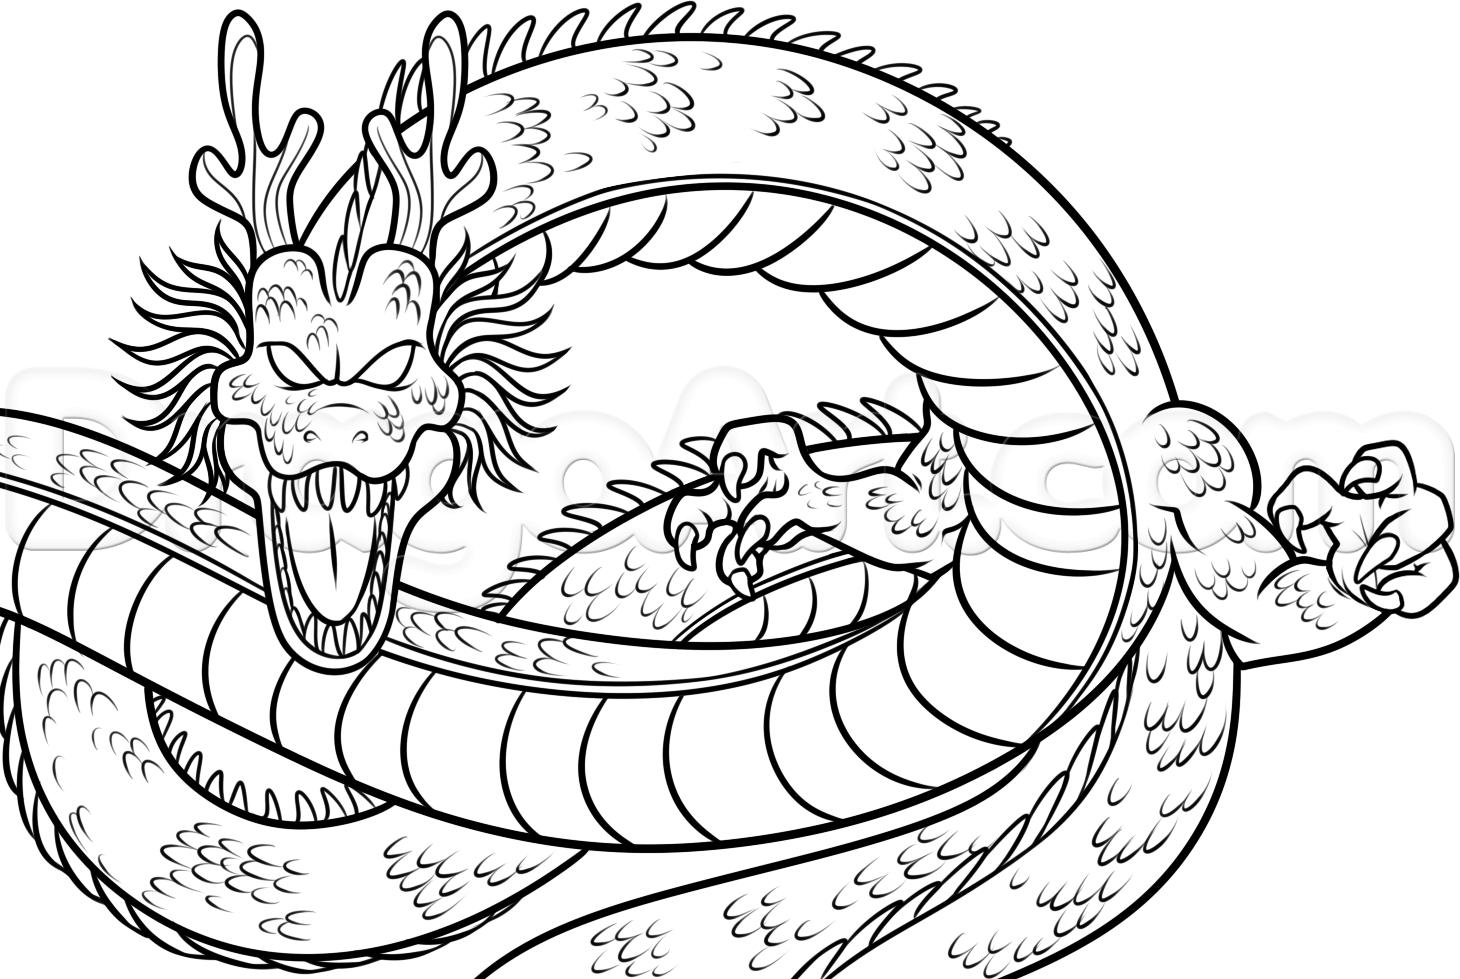 1460x979 Dragon Ball Z Drawings Goku And Vegeta Archives